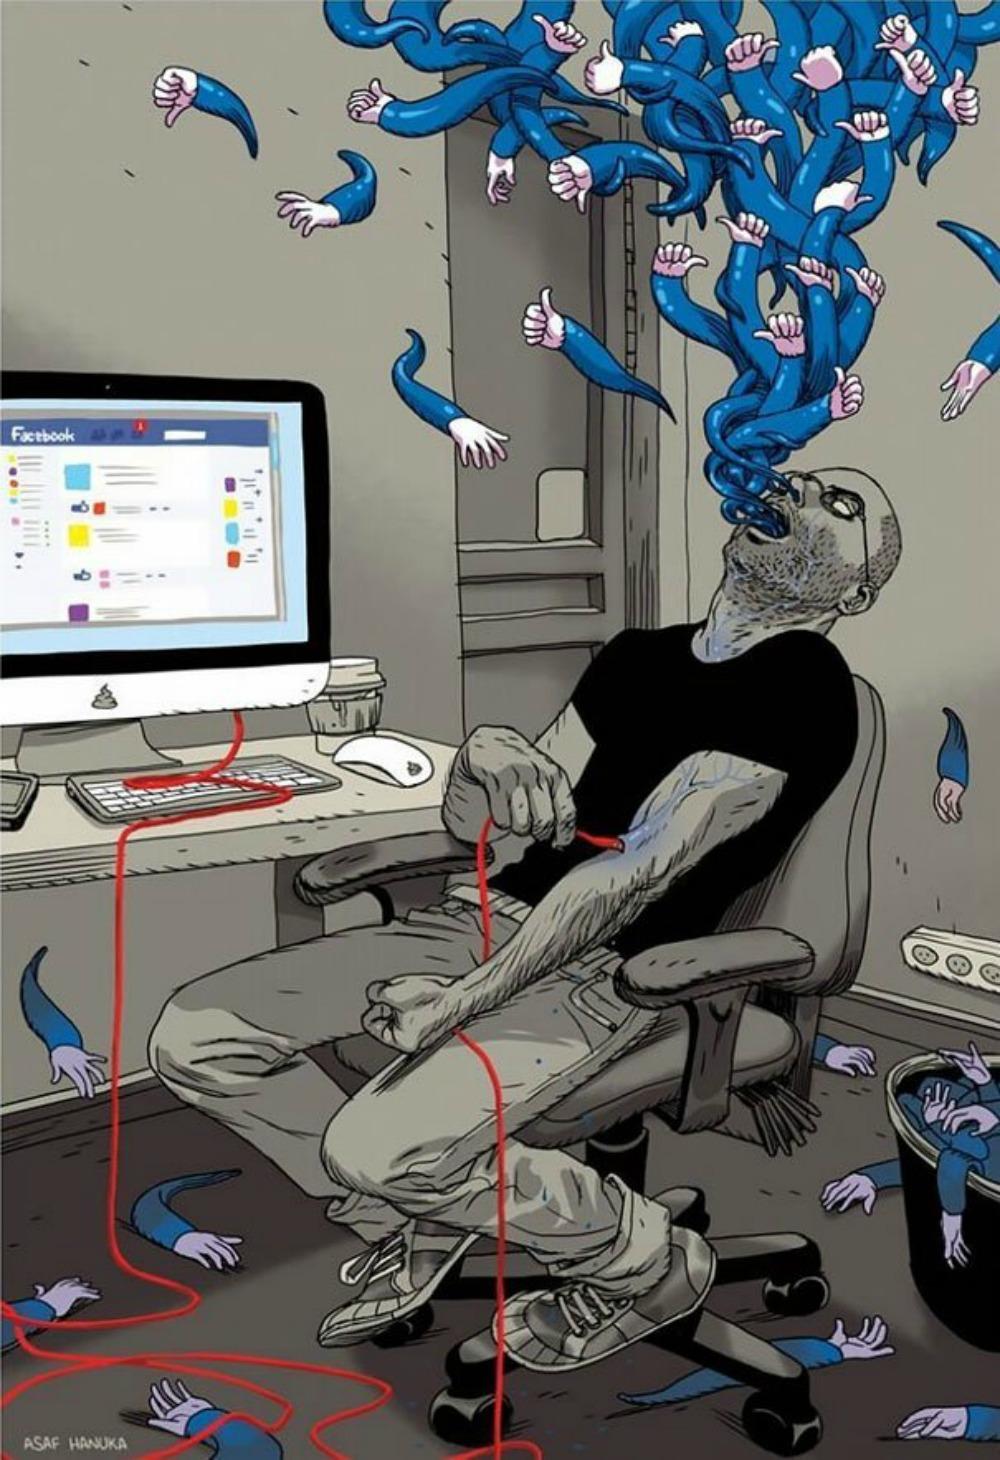 Satirical_Illustrations_Addiction_to_Technology10